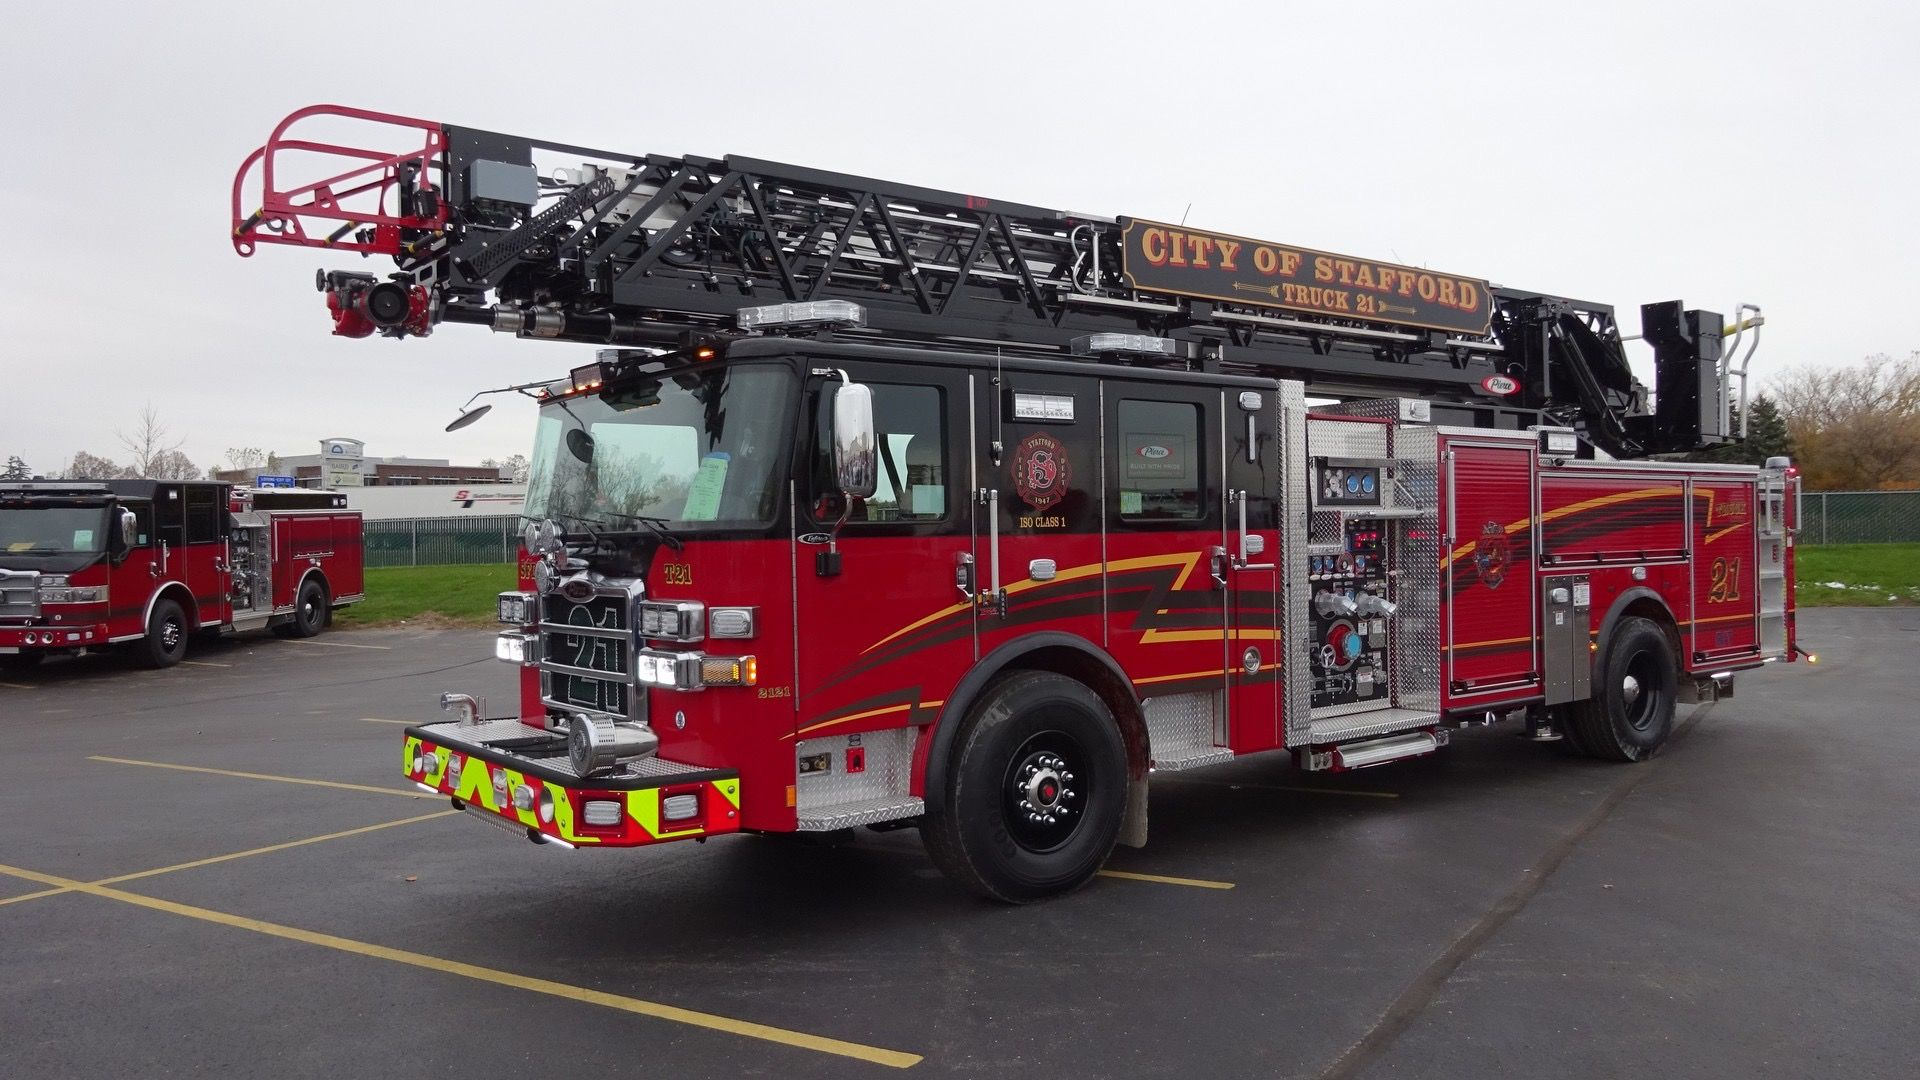 Stafford T21 Fire Trucks Fire Equipment Fire Engine